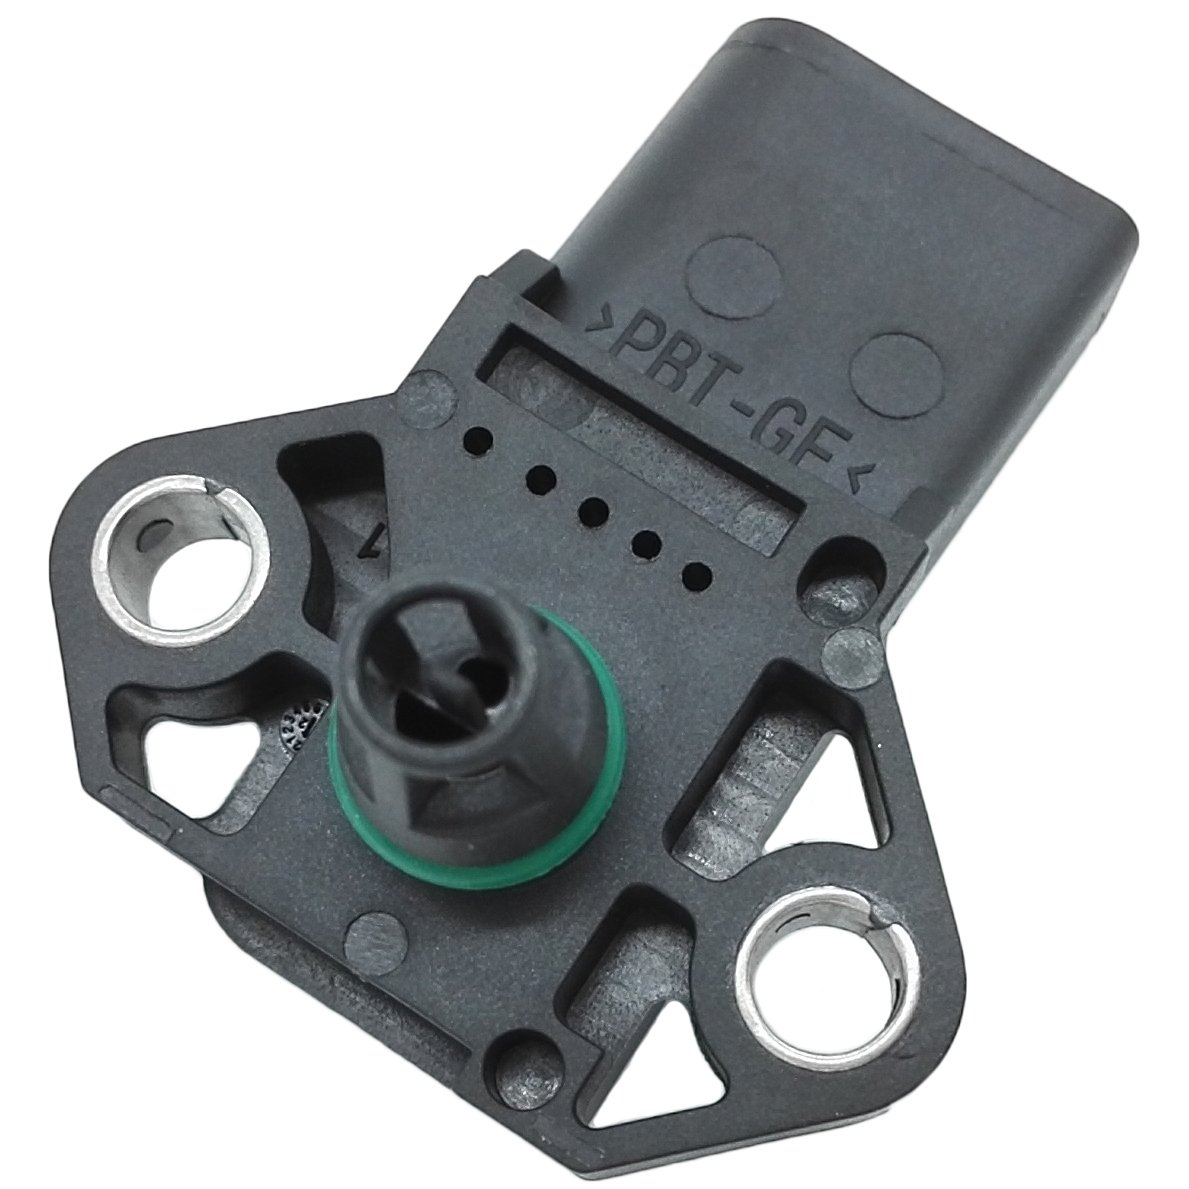 OKAY MOTOR DPFE EGR Pressure Feedback Sensor for Ford Mercury Lincoln Car Mazda Truck Bolt